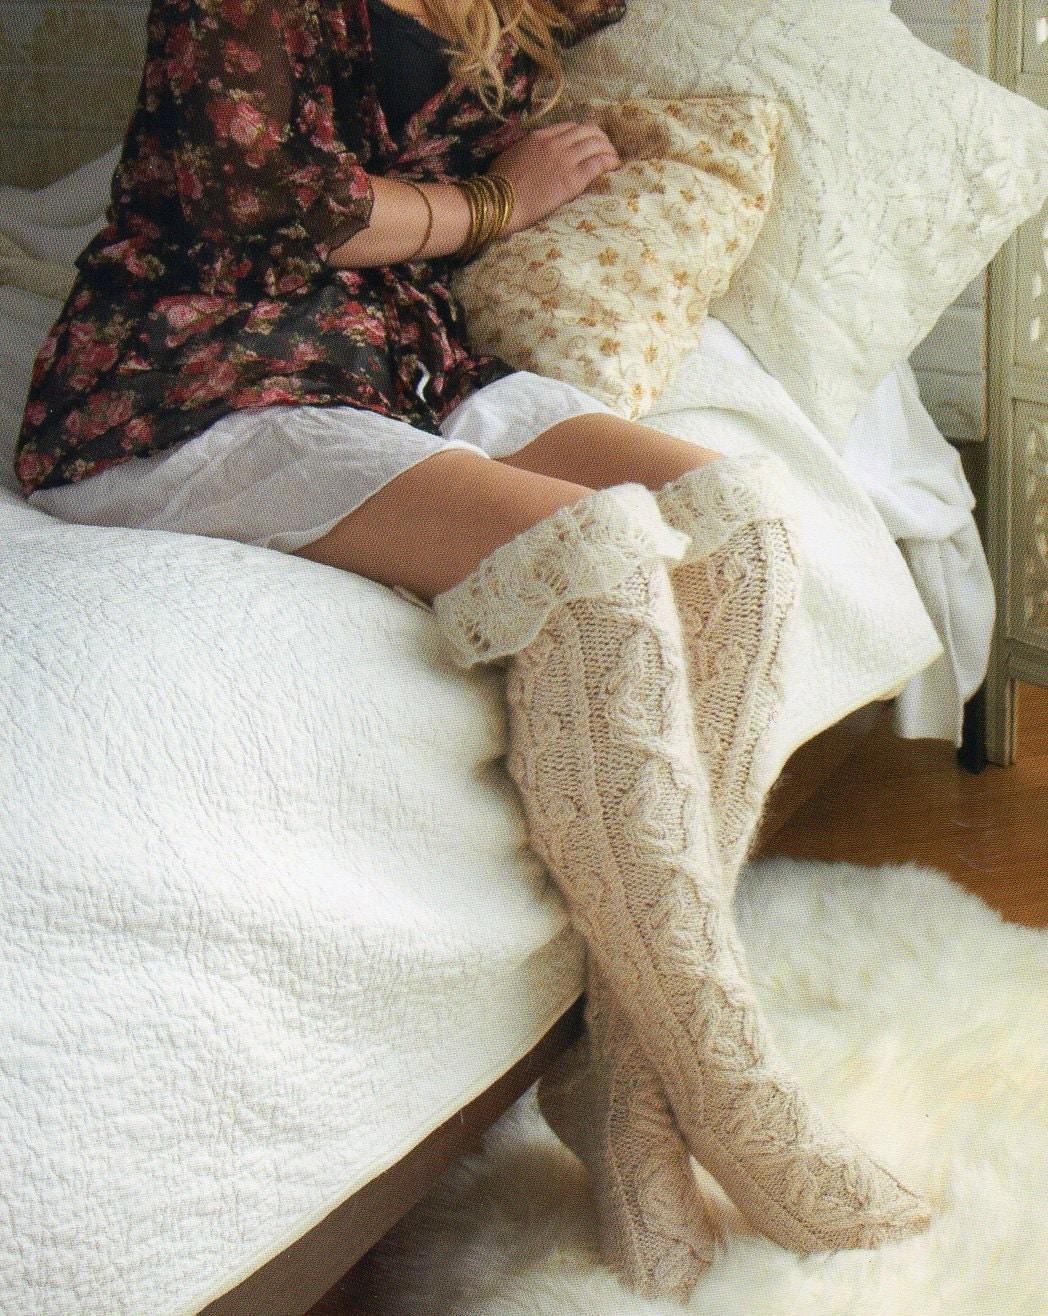 Sexy Knitting Patterns : Thigh High Stockings Socks Knitting Pattern by PatternMuseum